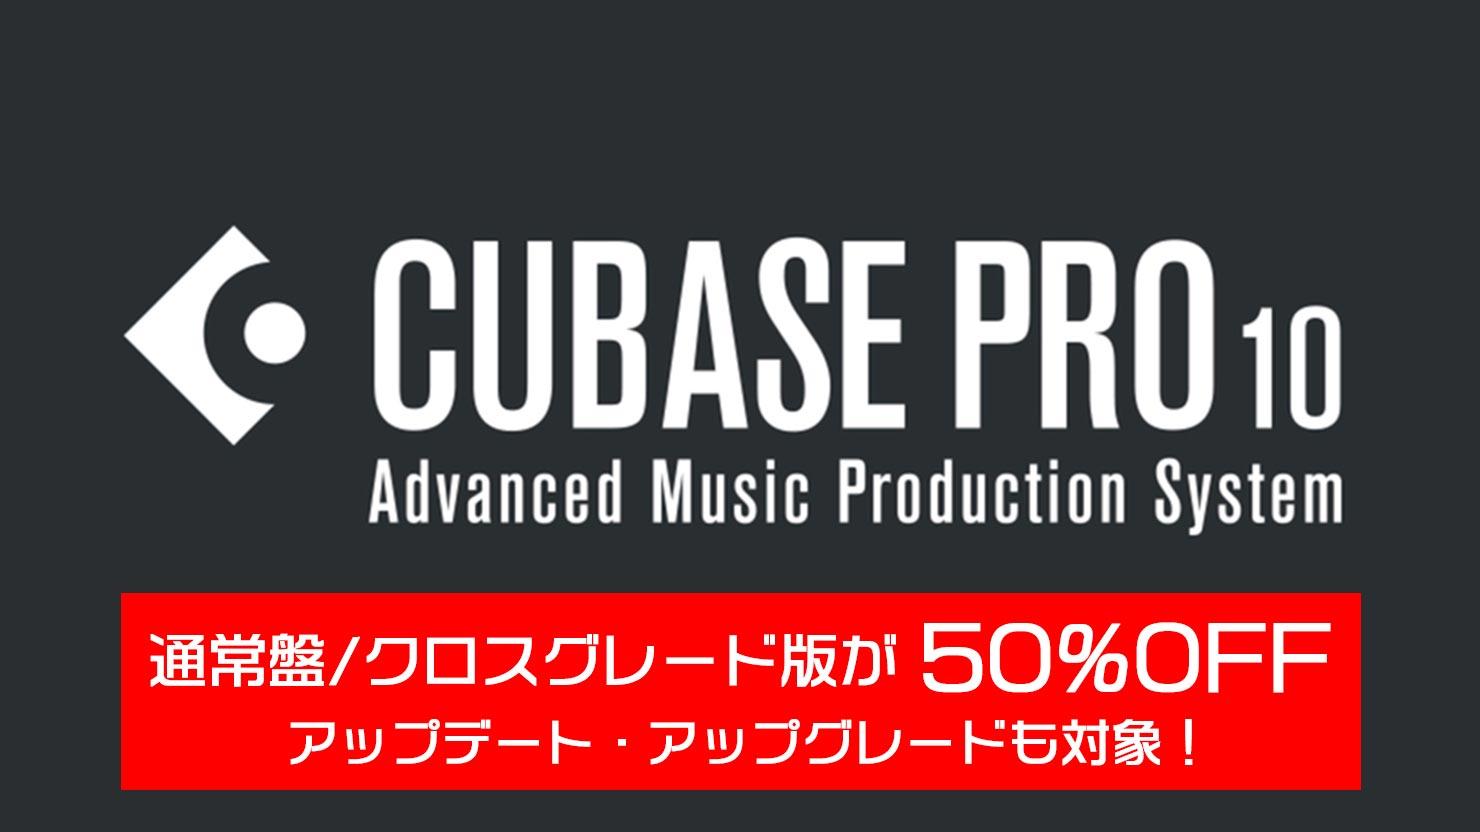 Cubase生誕30周年  Cubase Pro通常版/クロスグレード版などが50%オフ